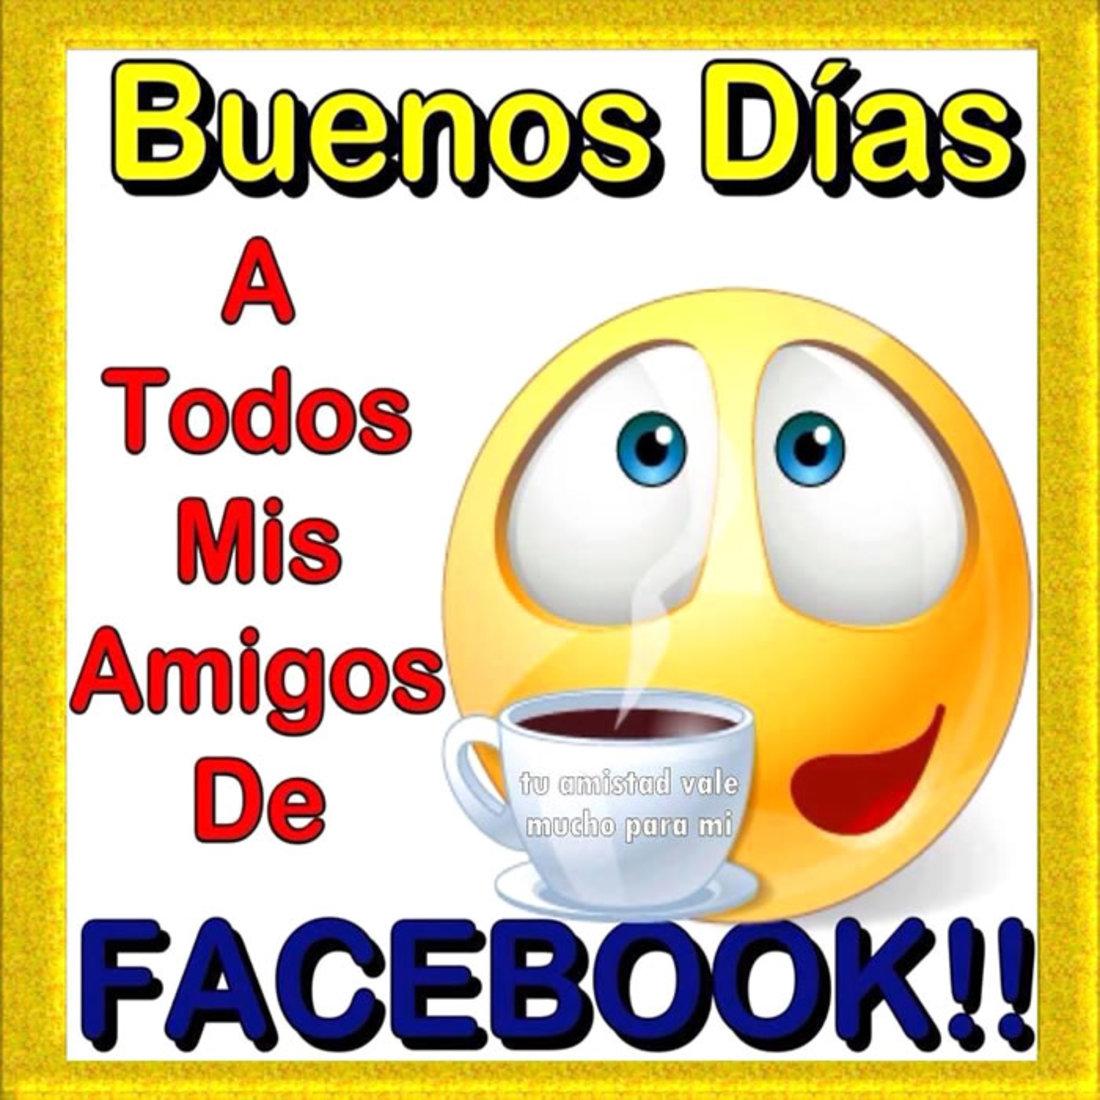 Buenos Días a todos mis amigos de Facebook!!